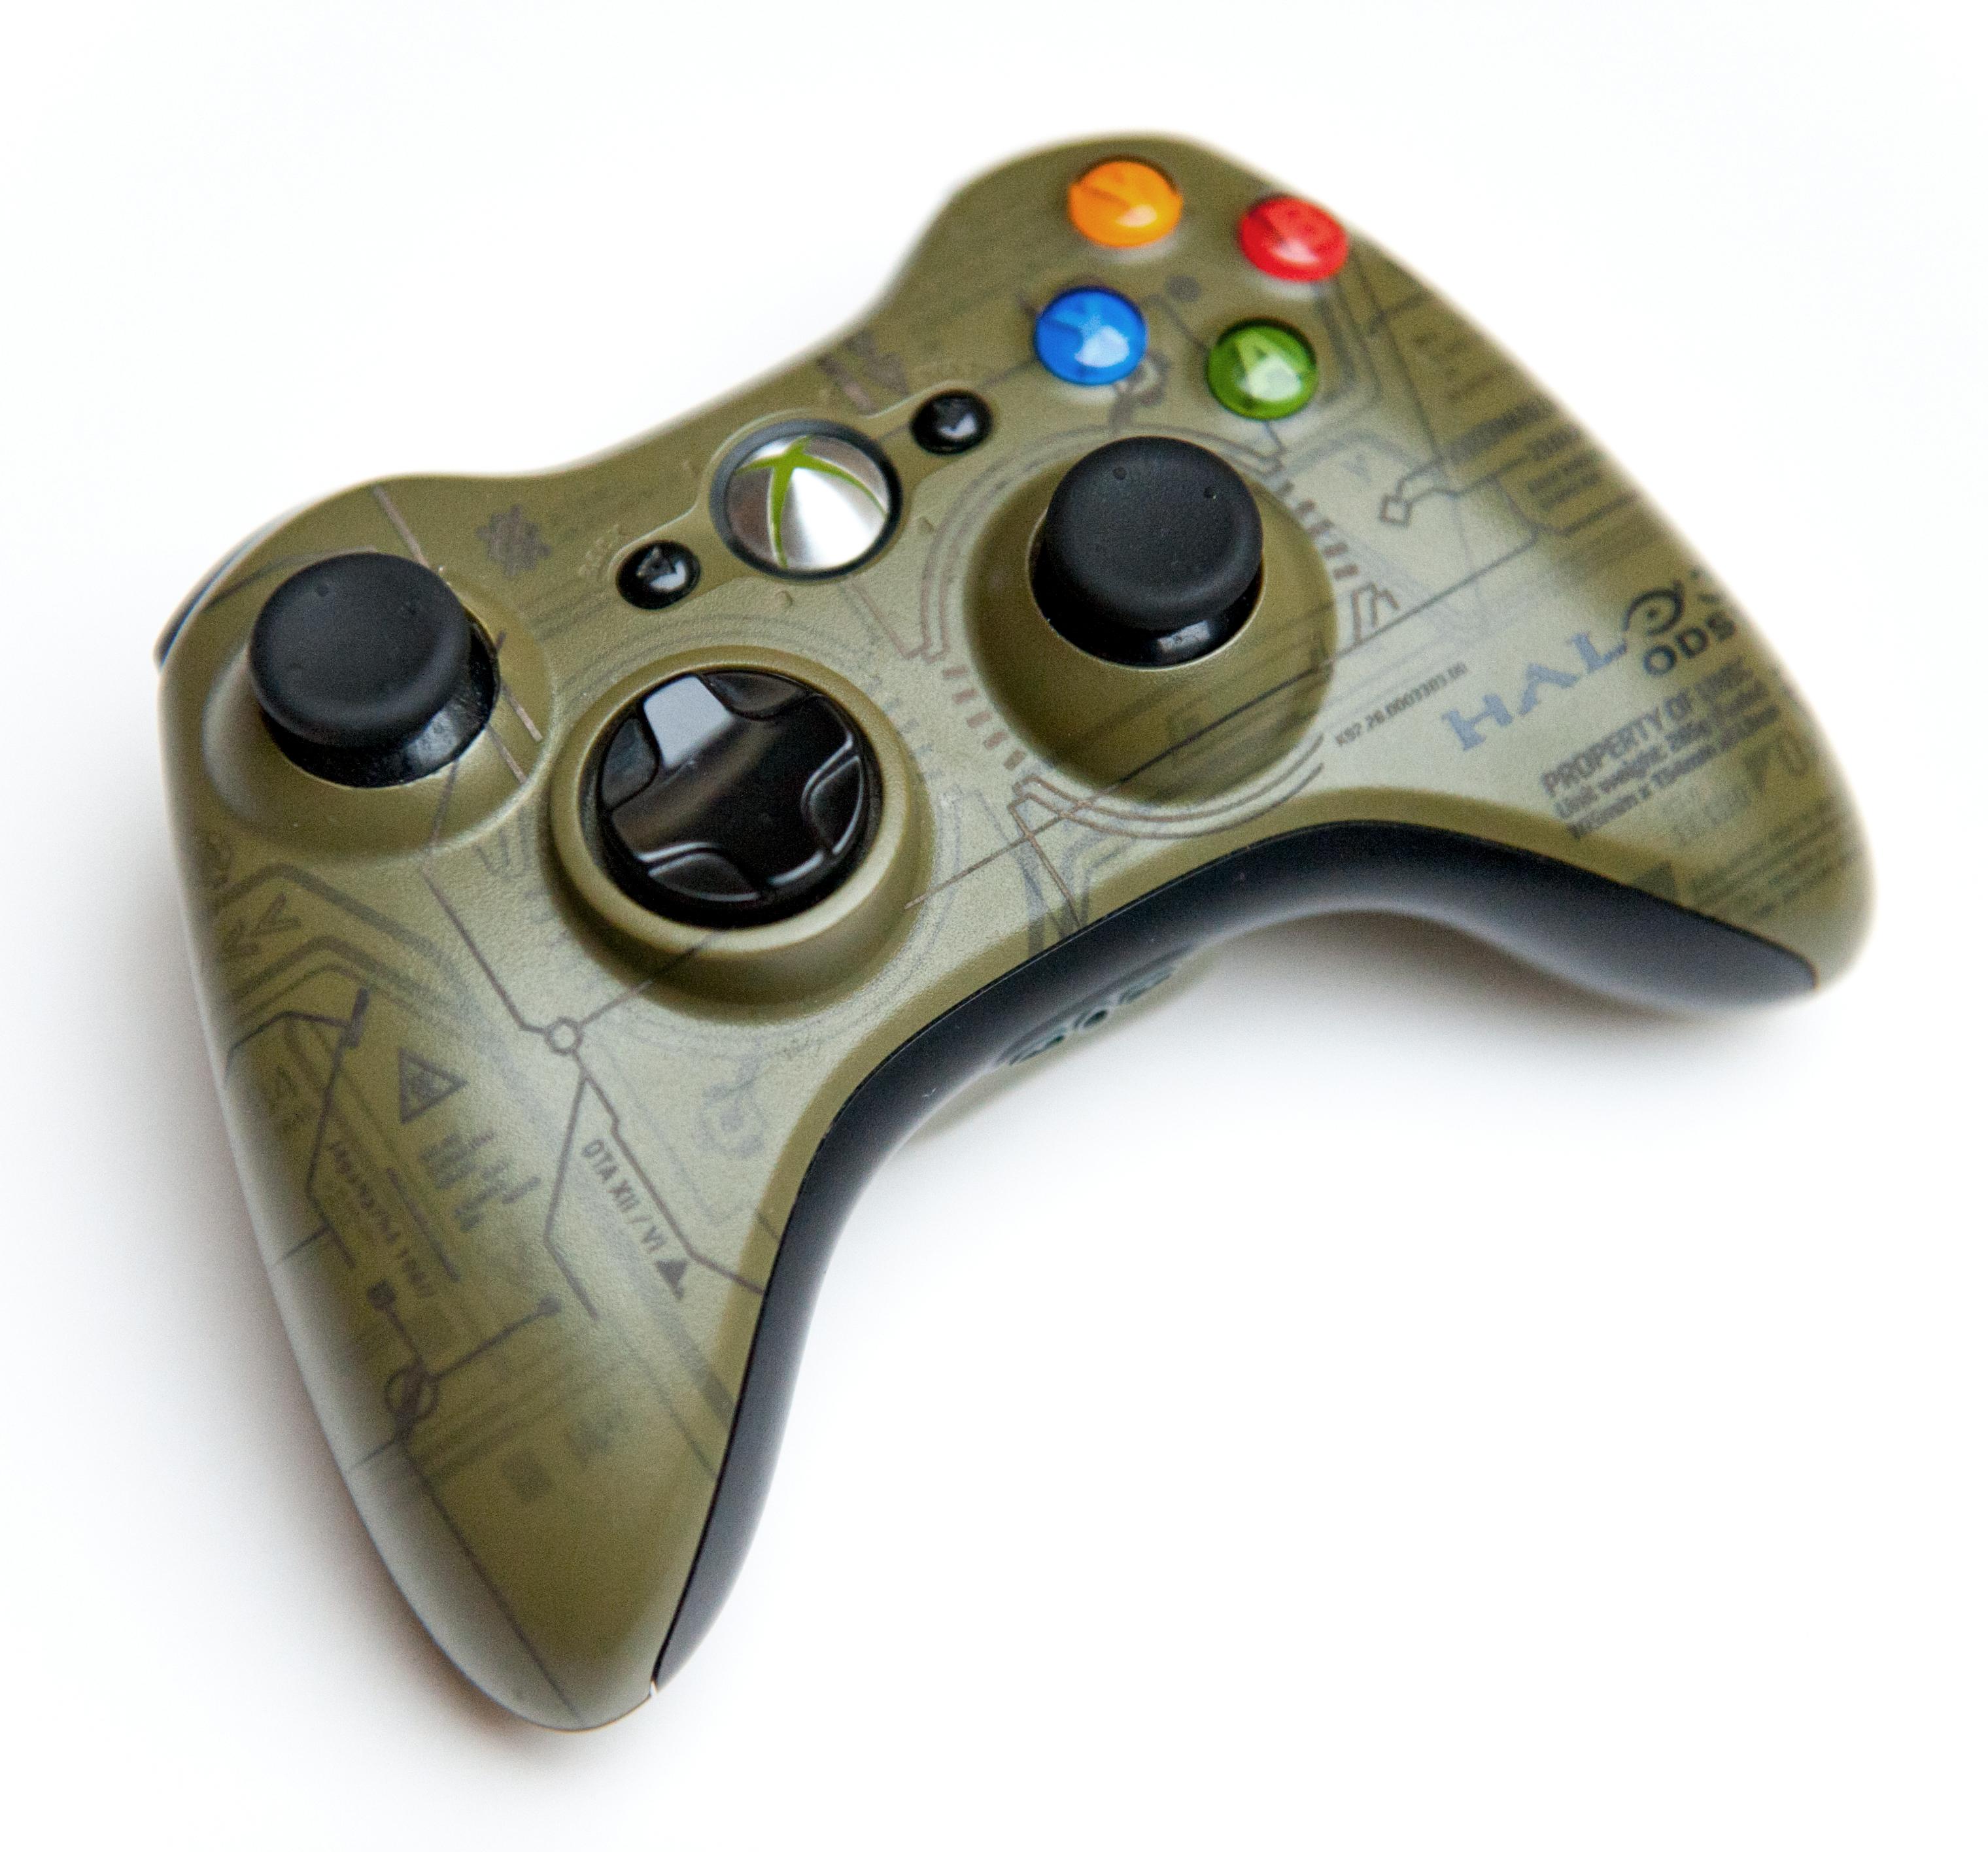 Halo_3_ODST_Xbox_360_controller.jpg